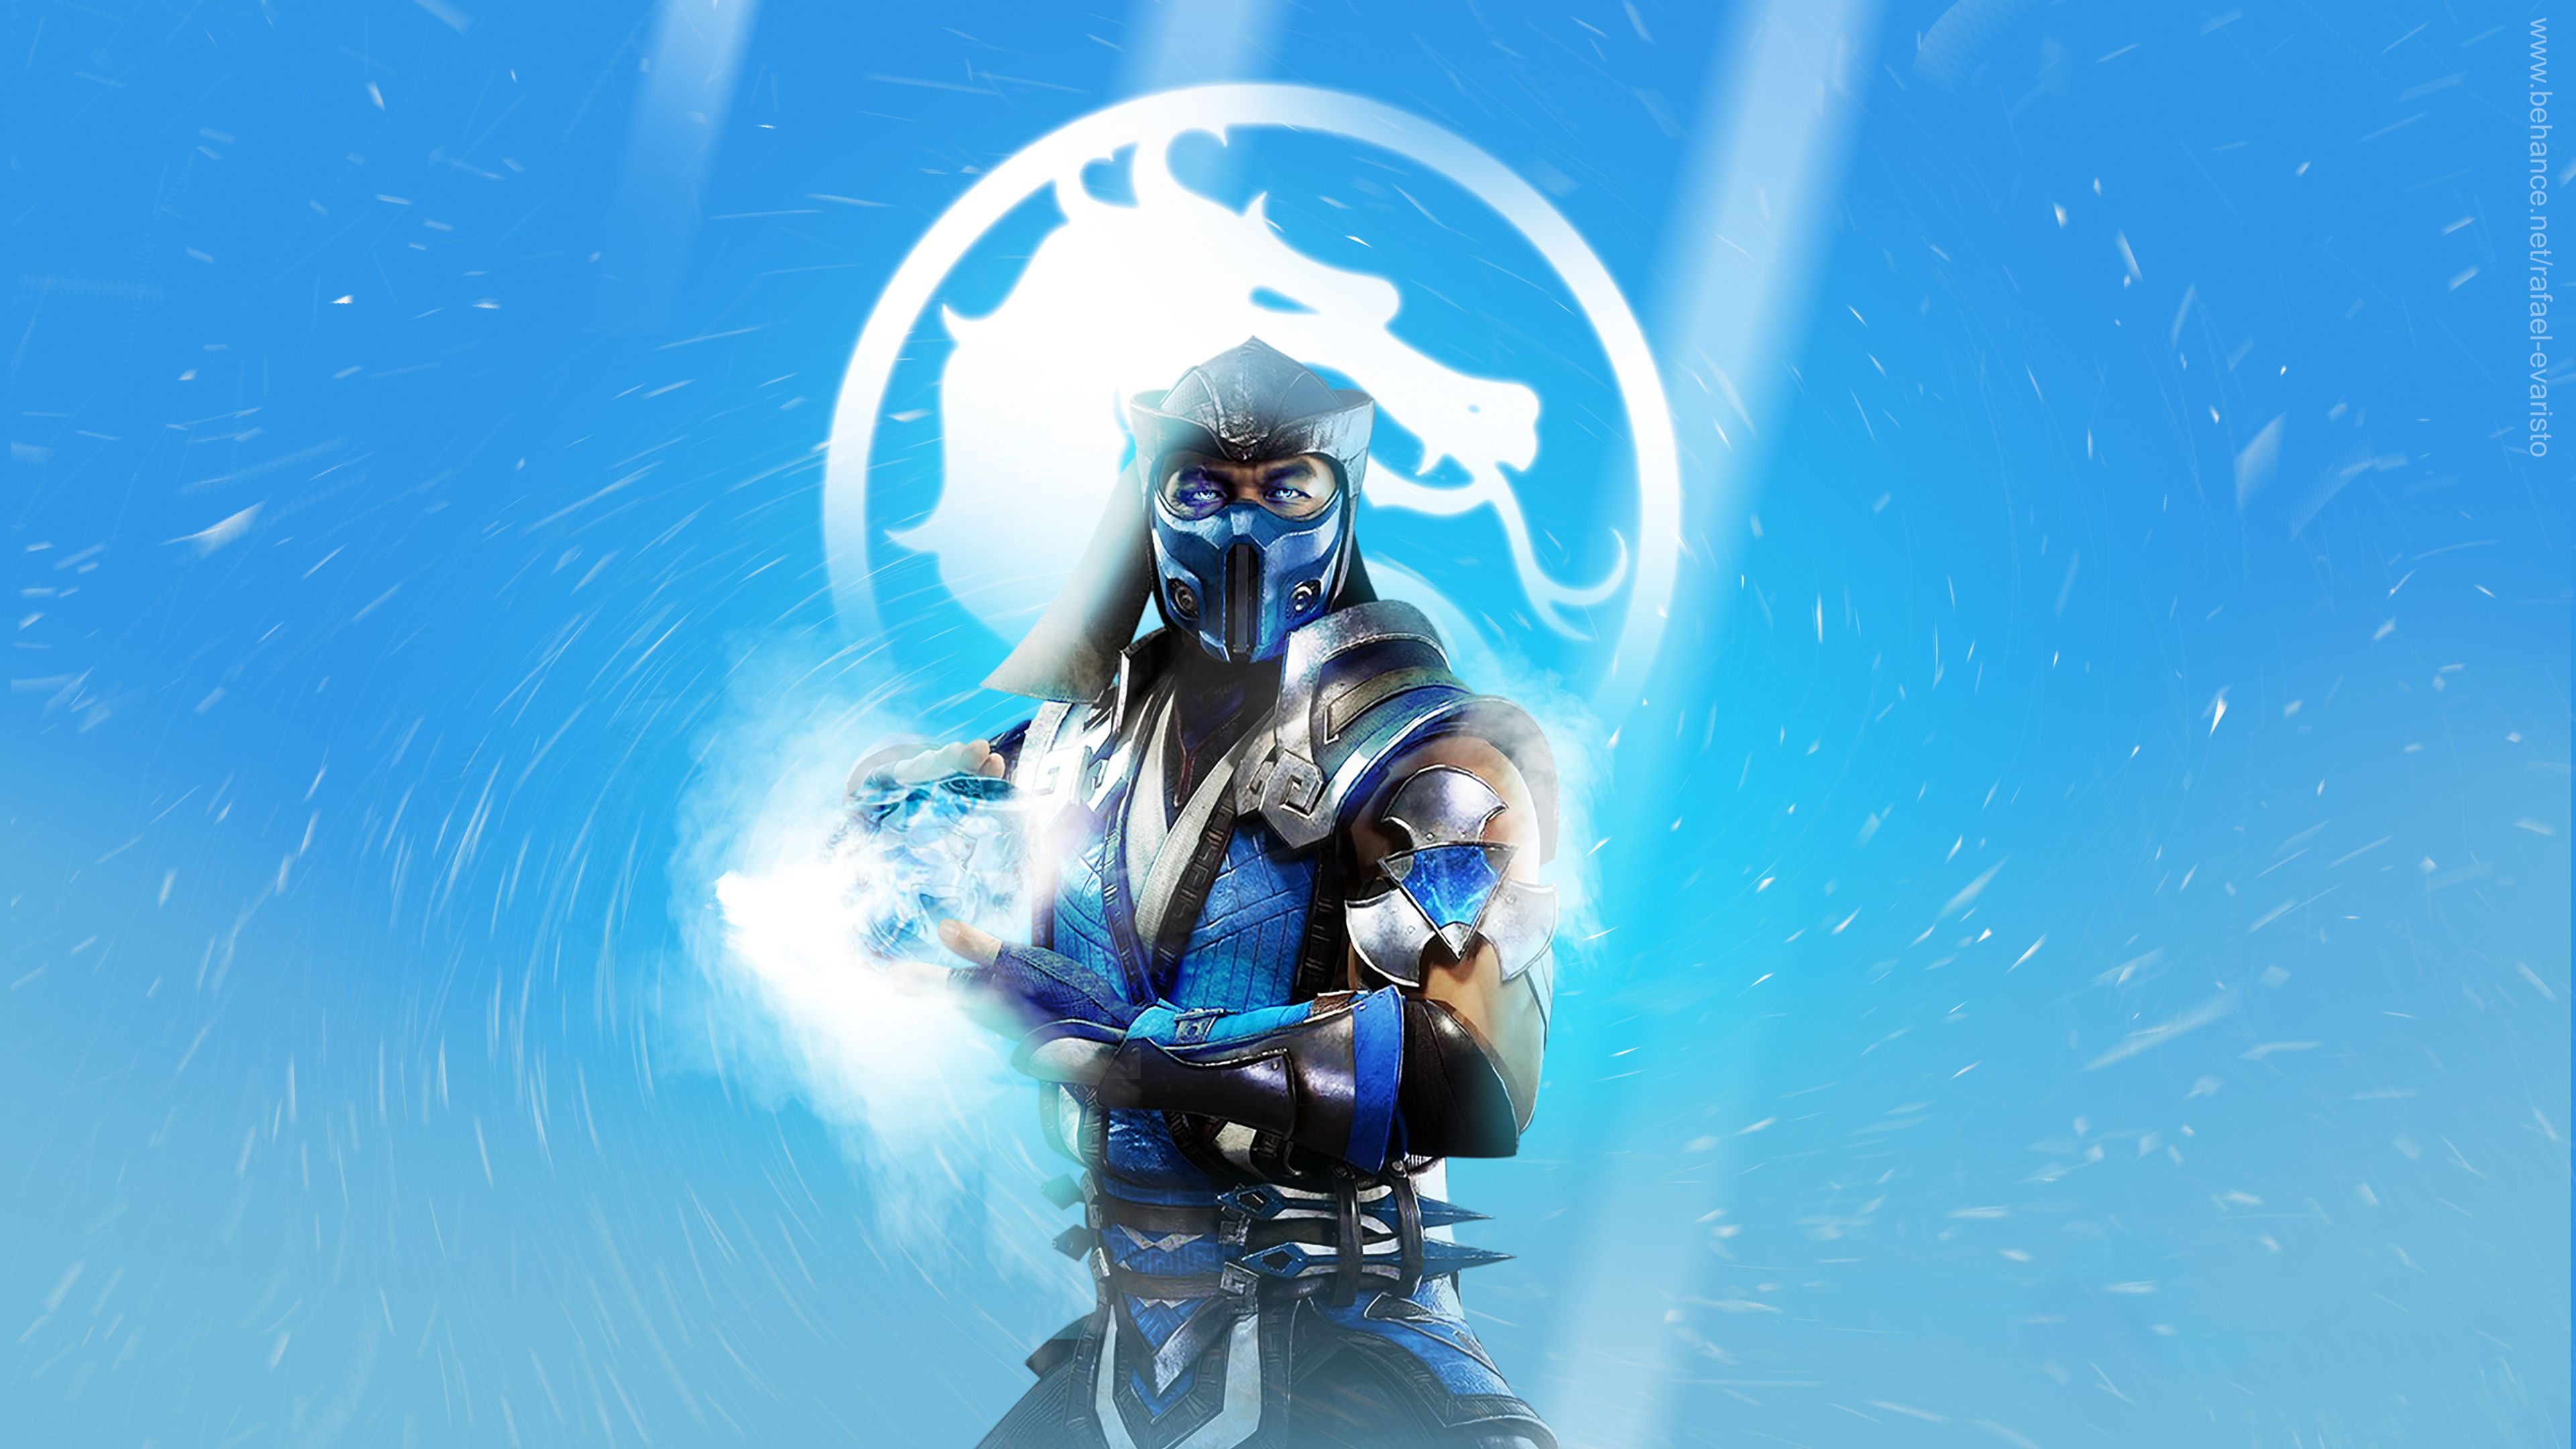 Mortal Kombat Sub Zero 4k 2019 Hd Games 4k Wallpapers Images